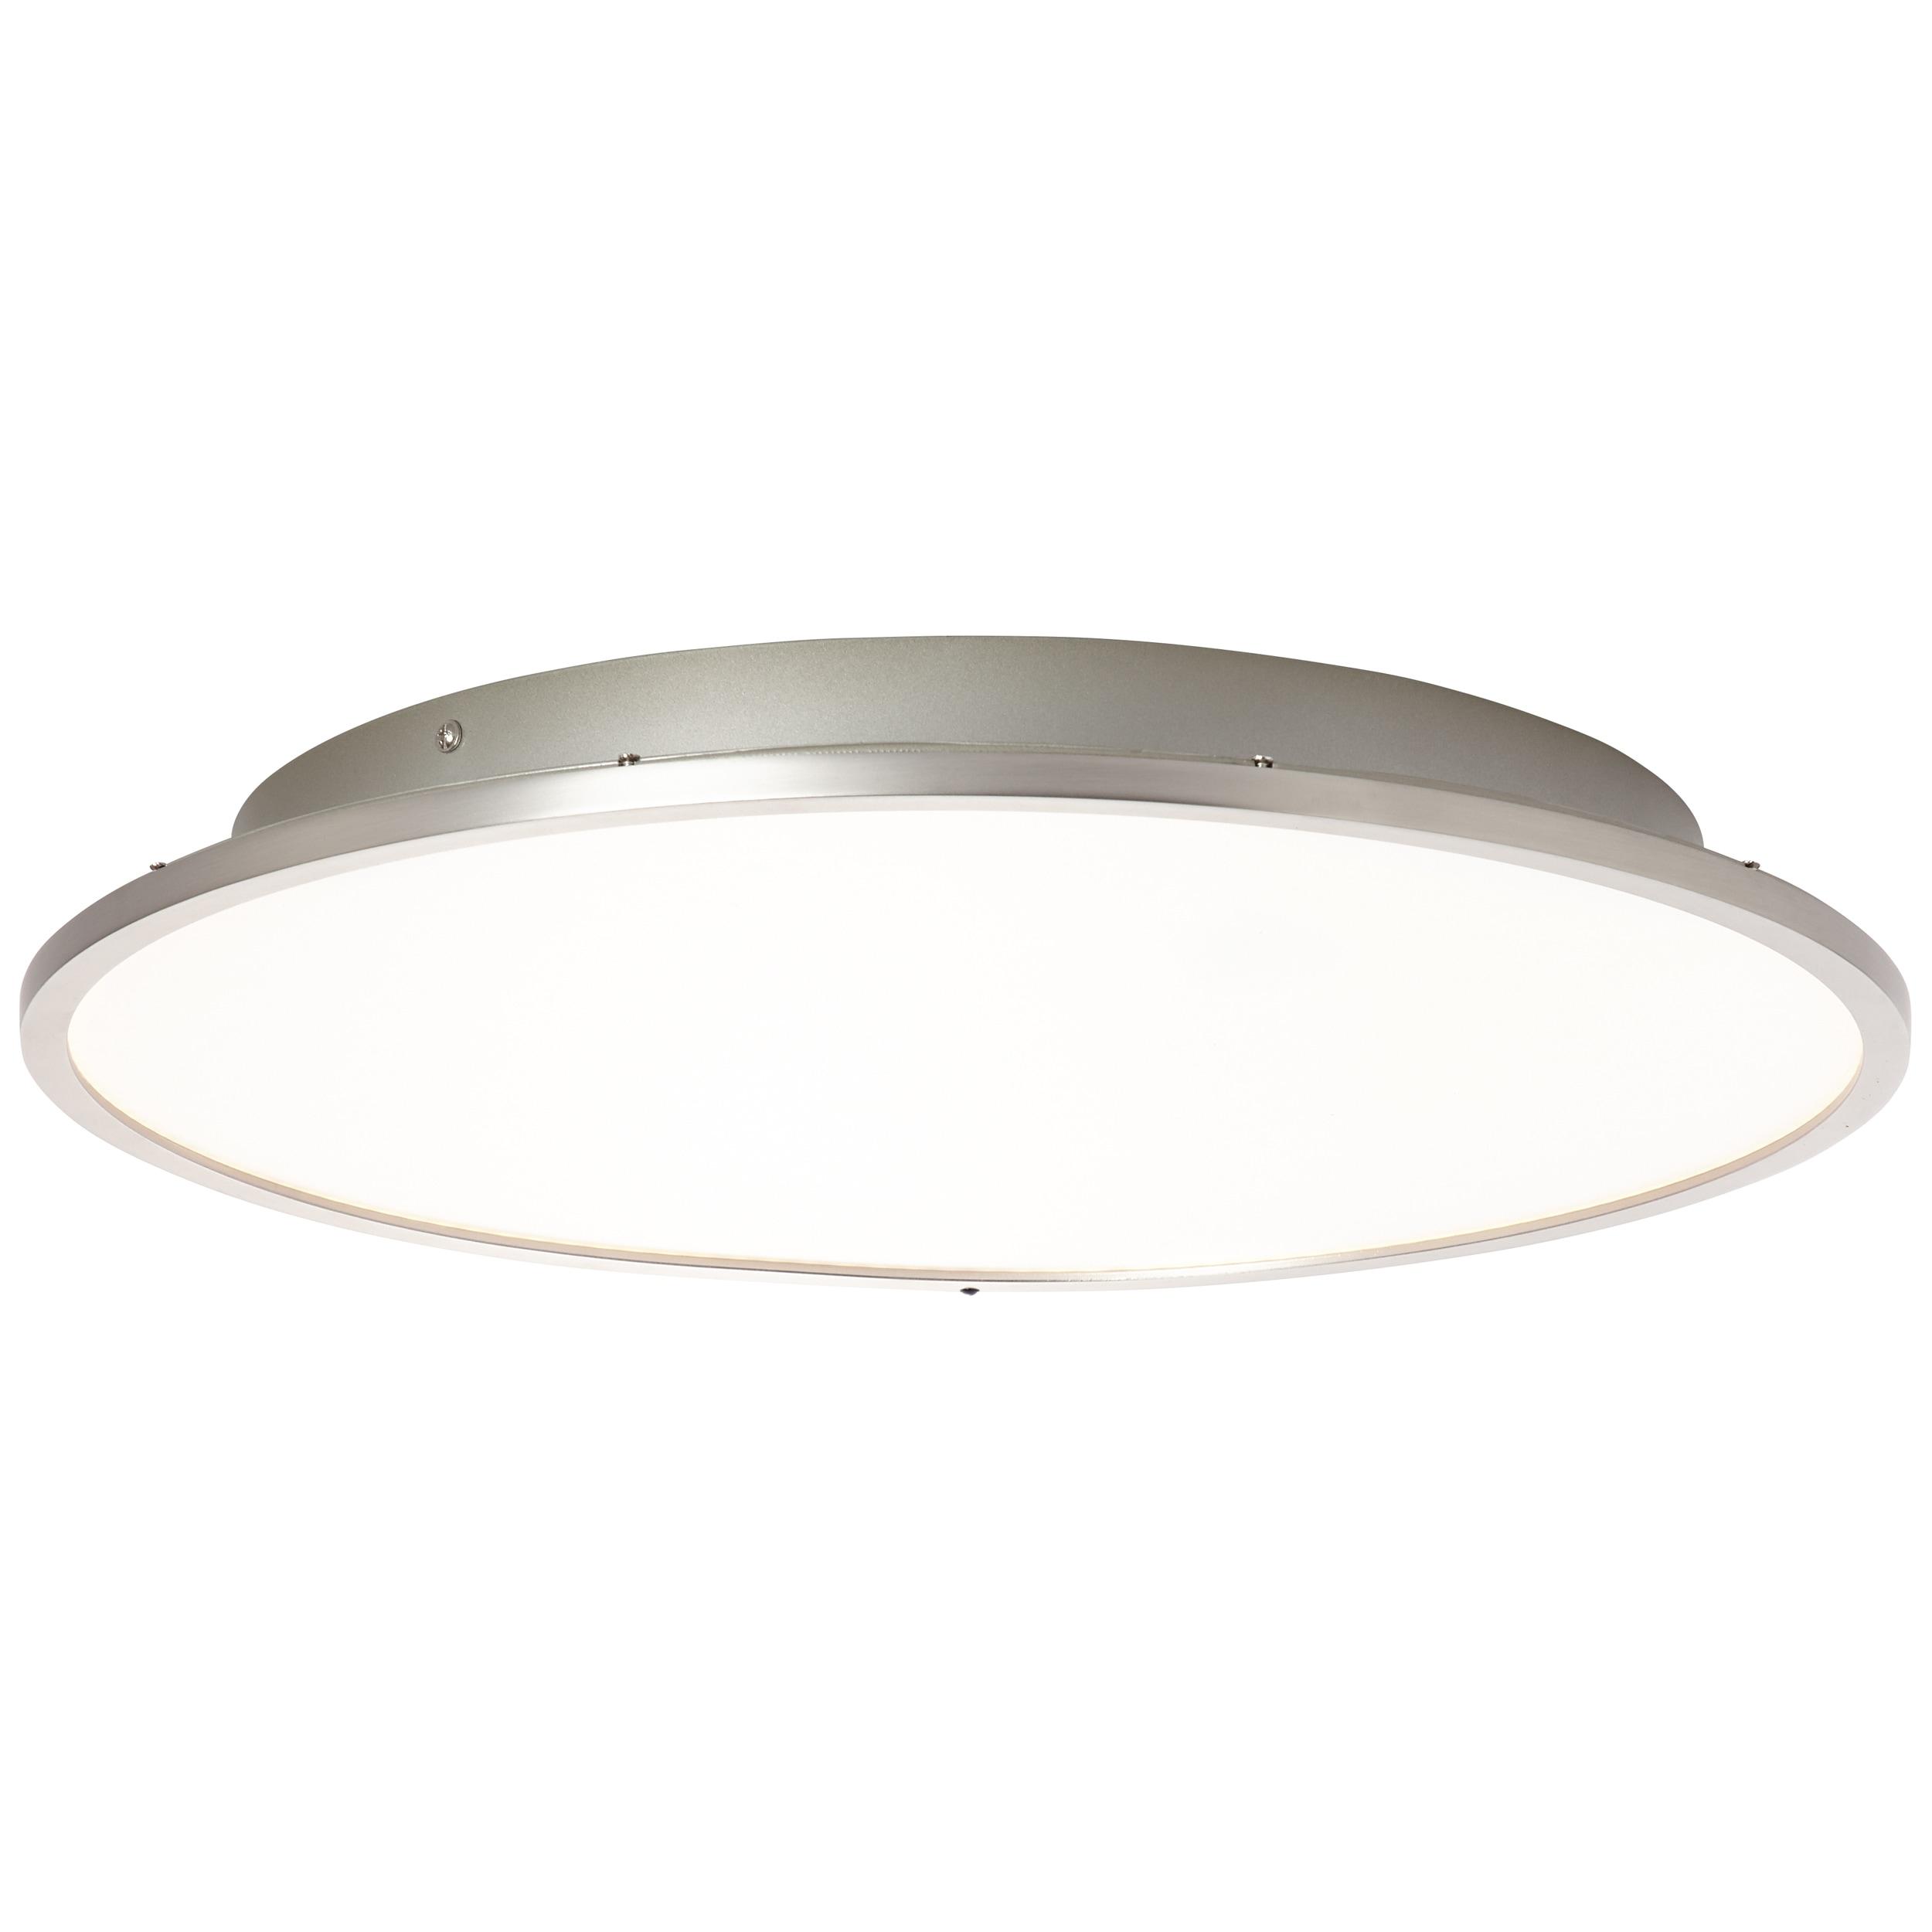 AEG Devin WiZ LED Deckenaufbau-Paneel 45cm nickel